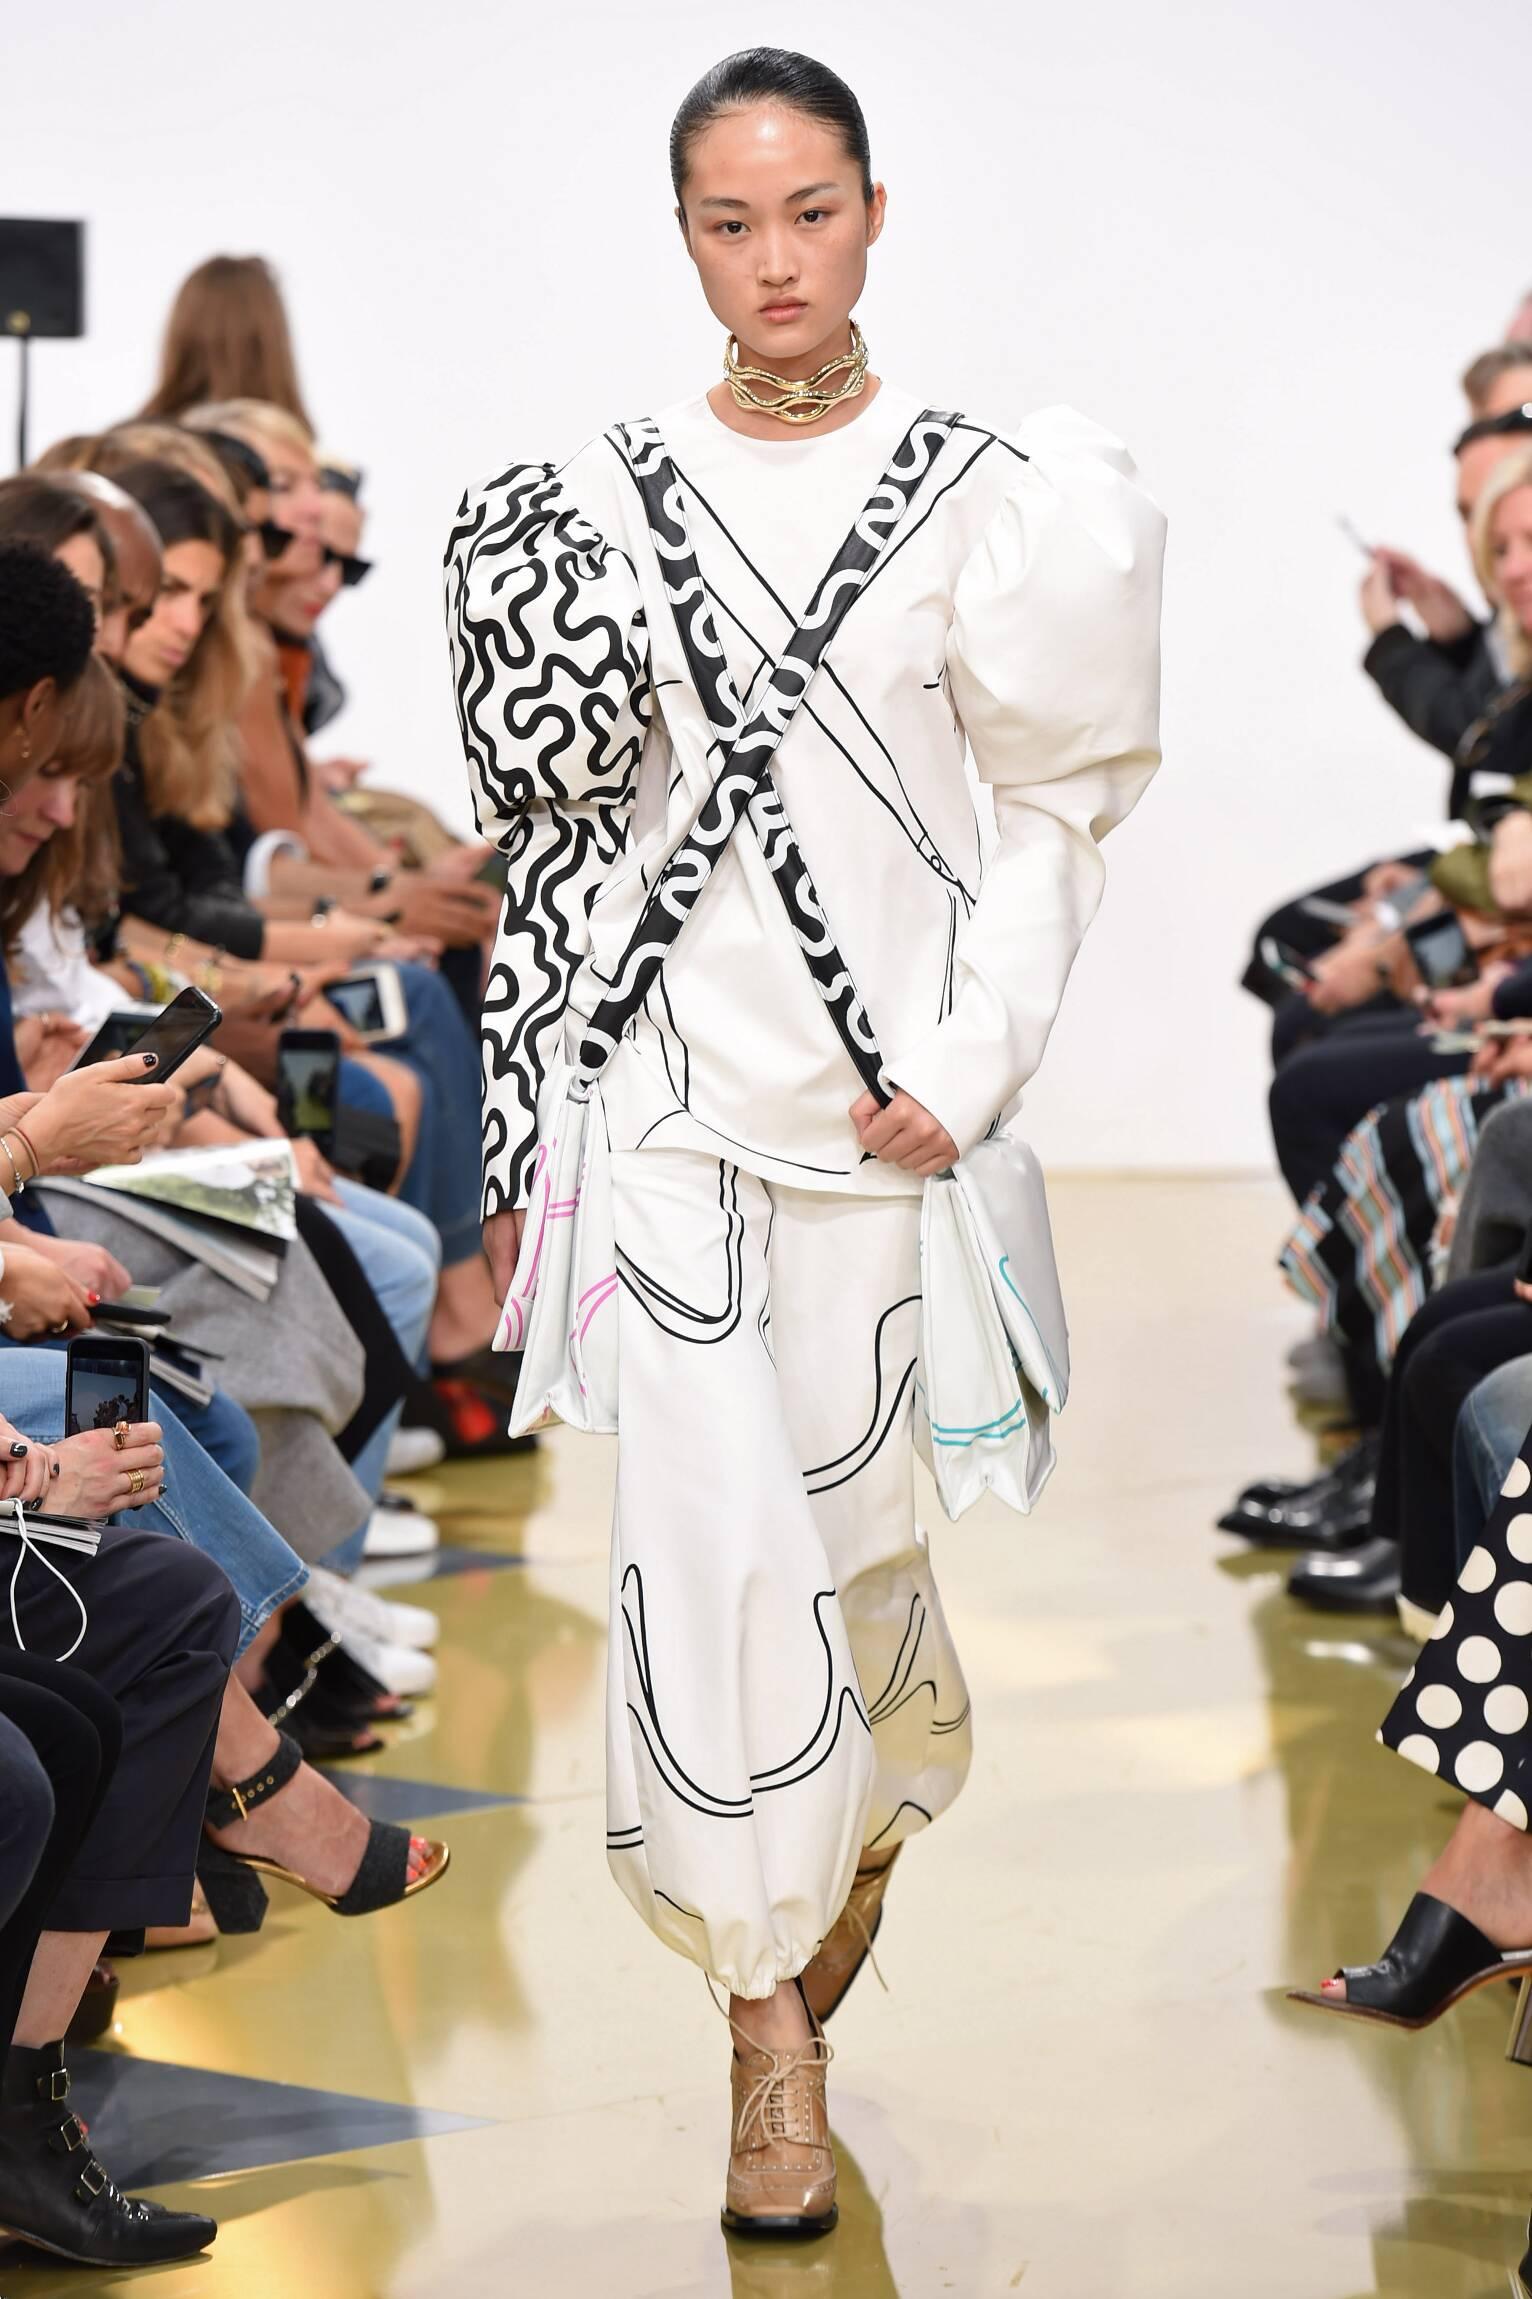 Fashion Womenswear J.W. Anderson Collection Catwalk